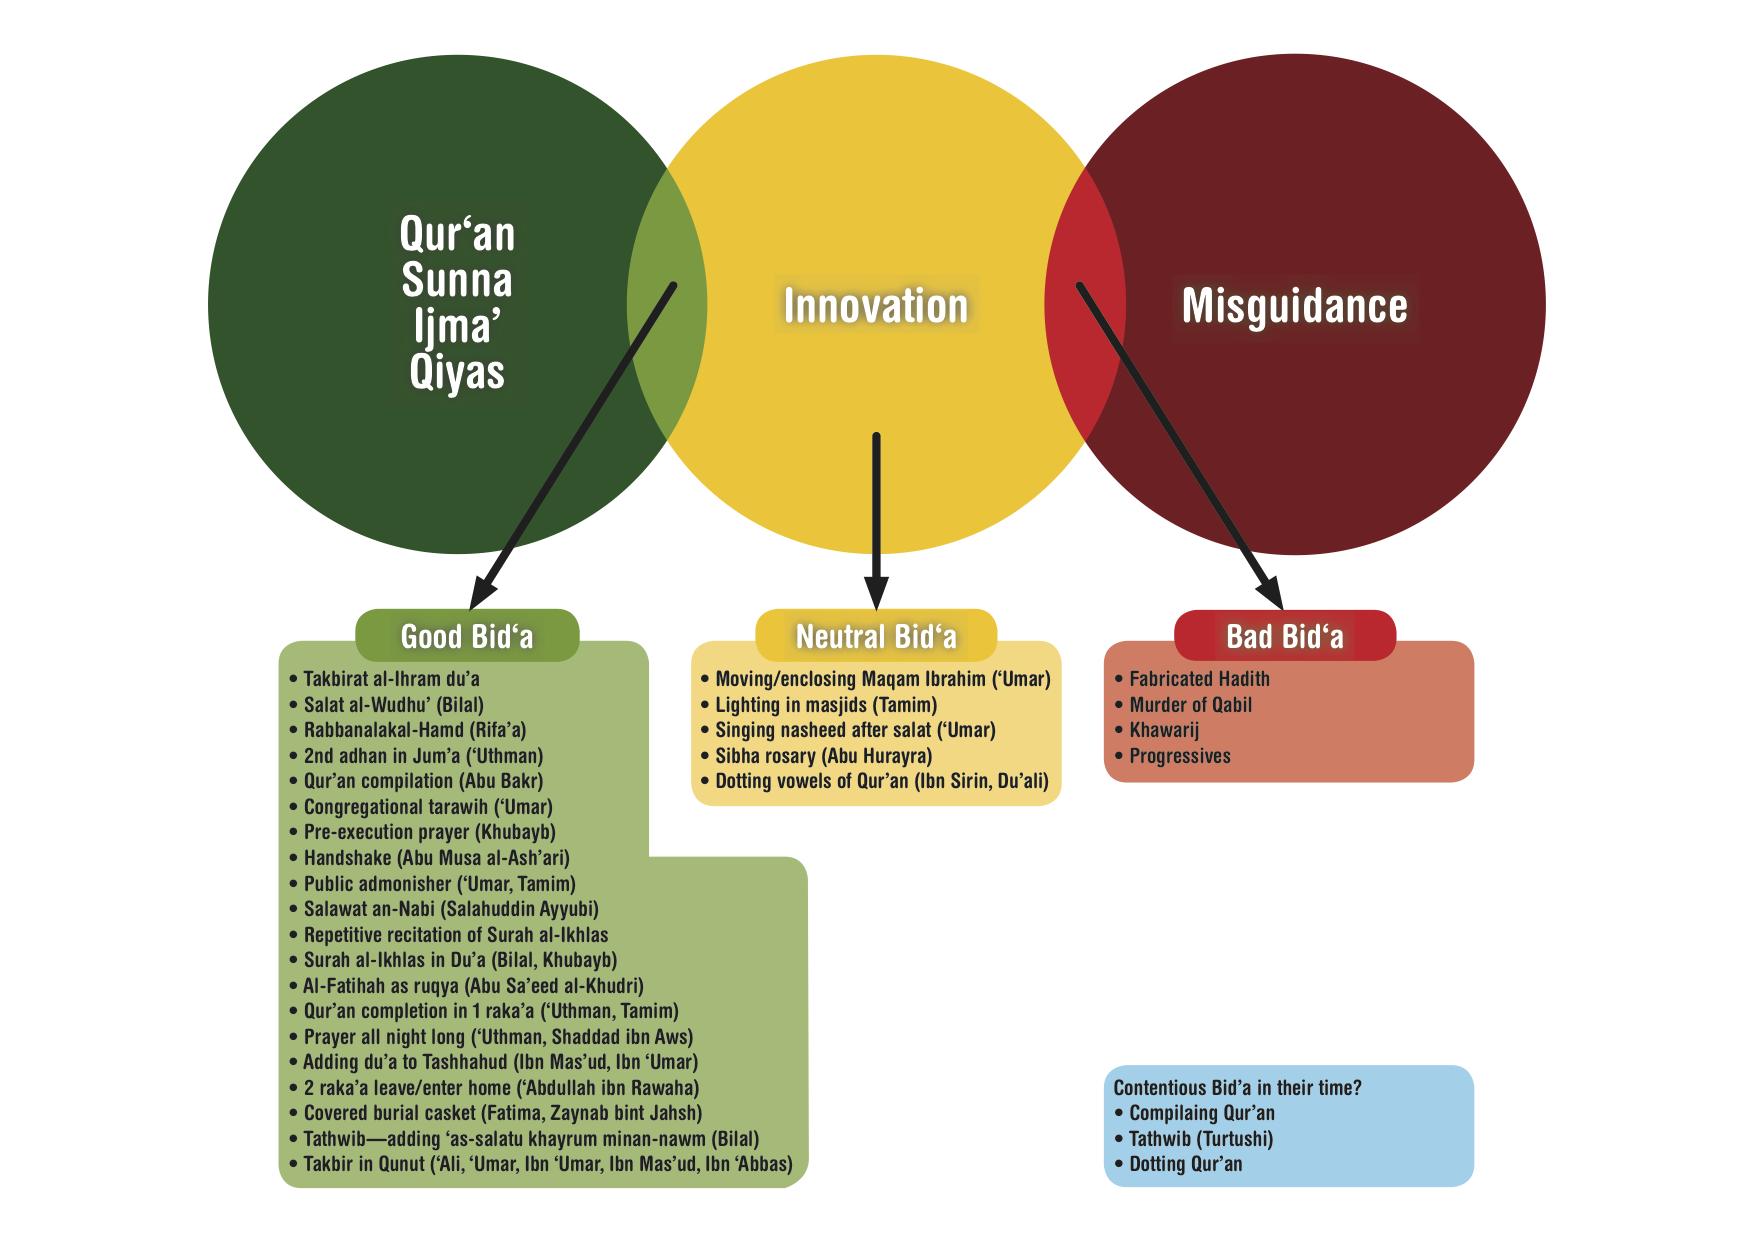 Muslimology dawah research and development page 2 bida venn diagram understanding pooptronica